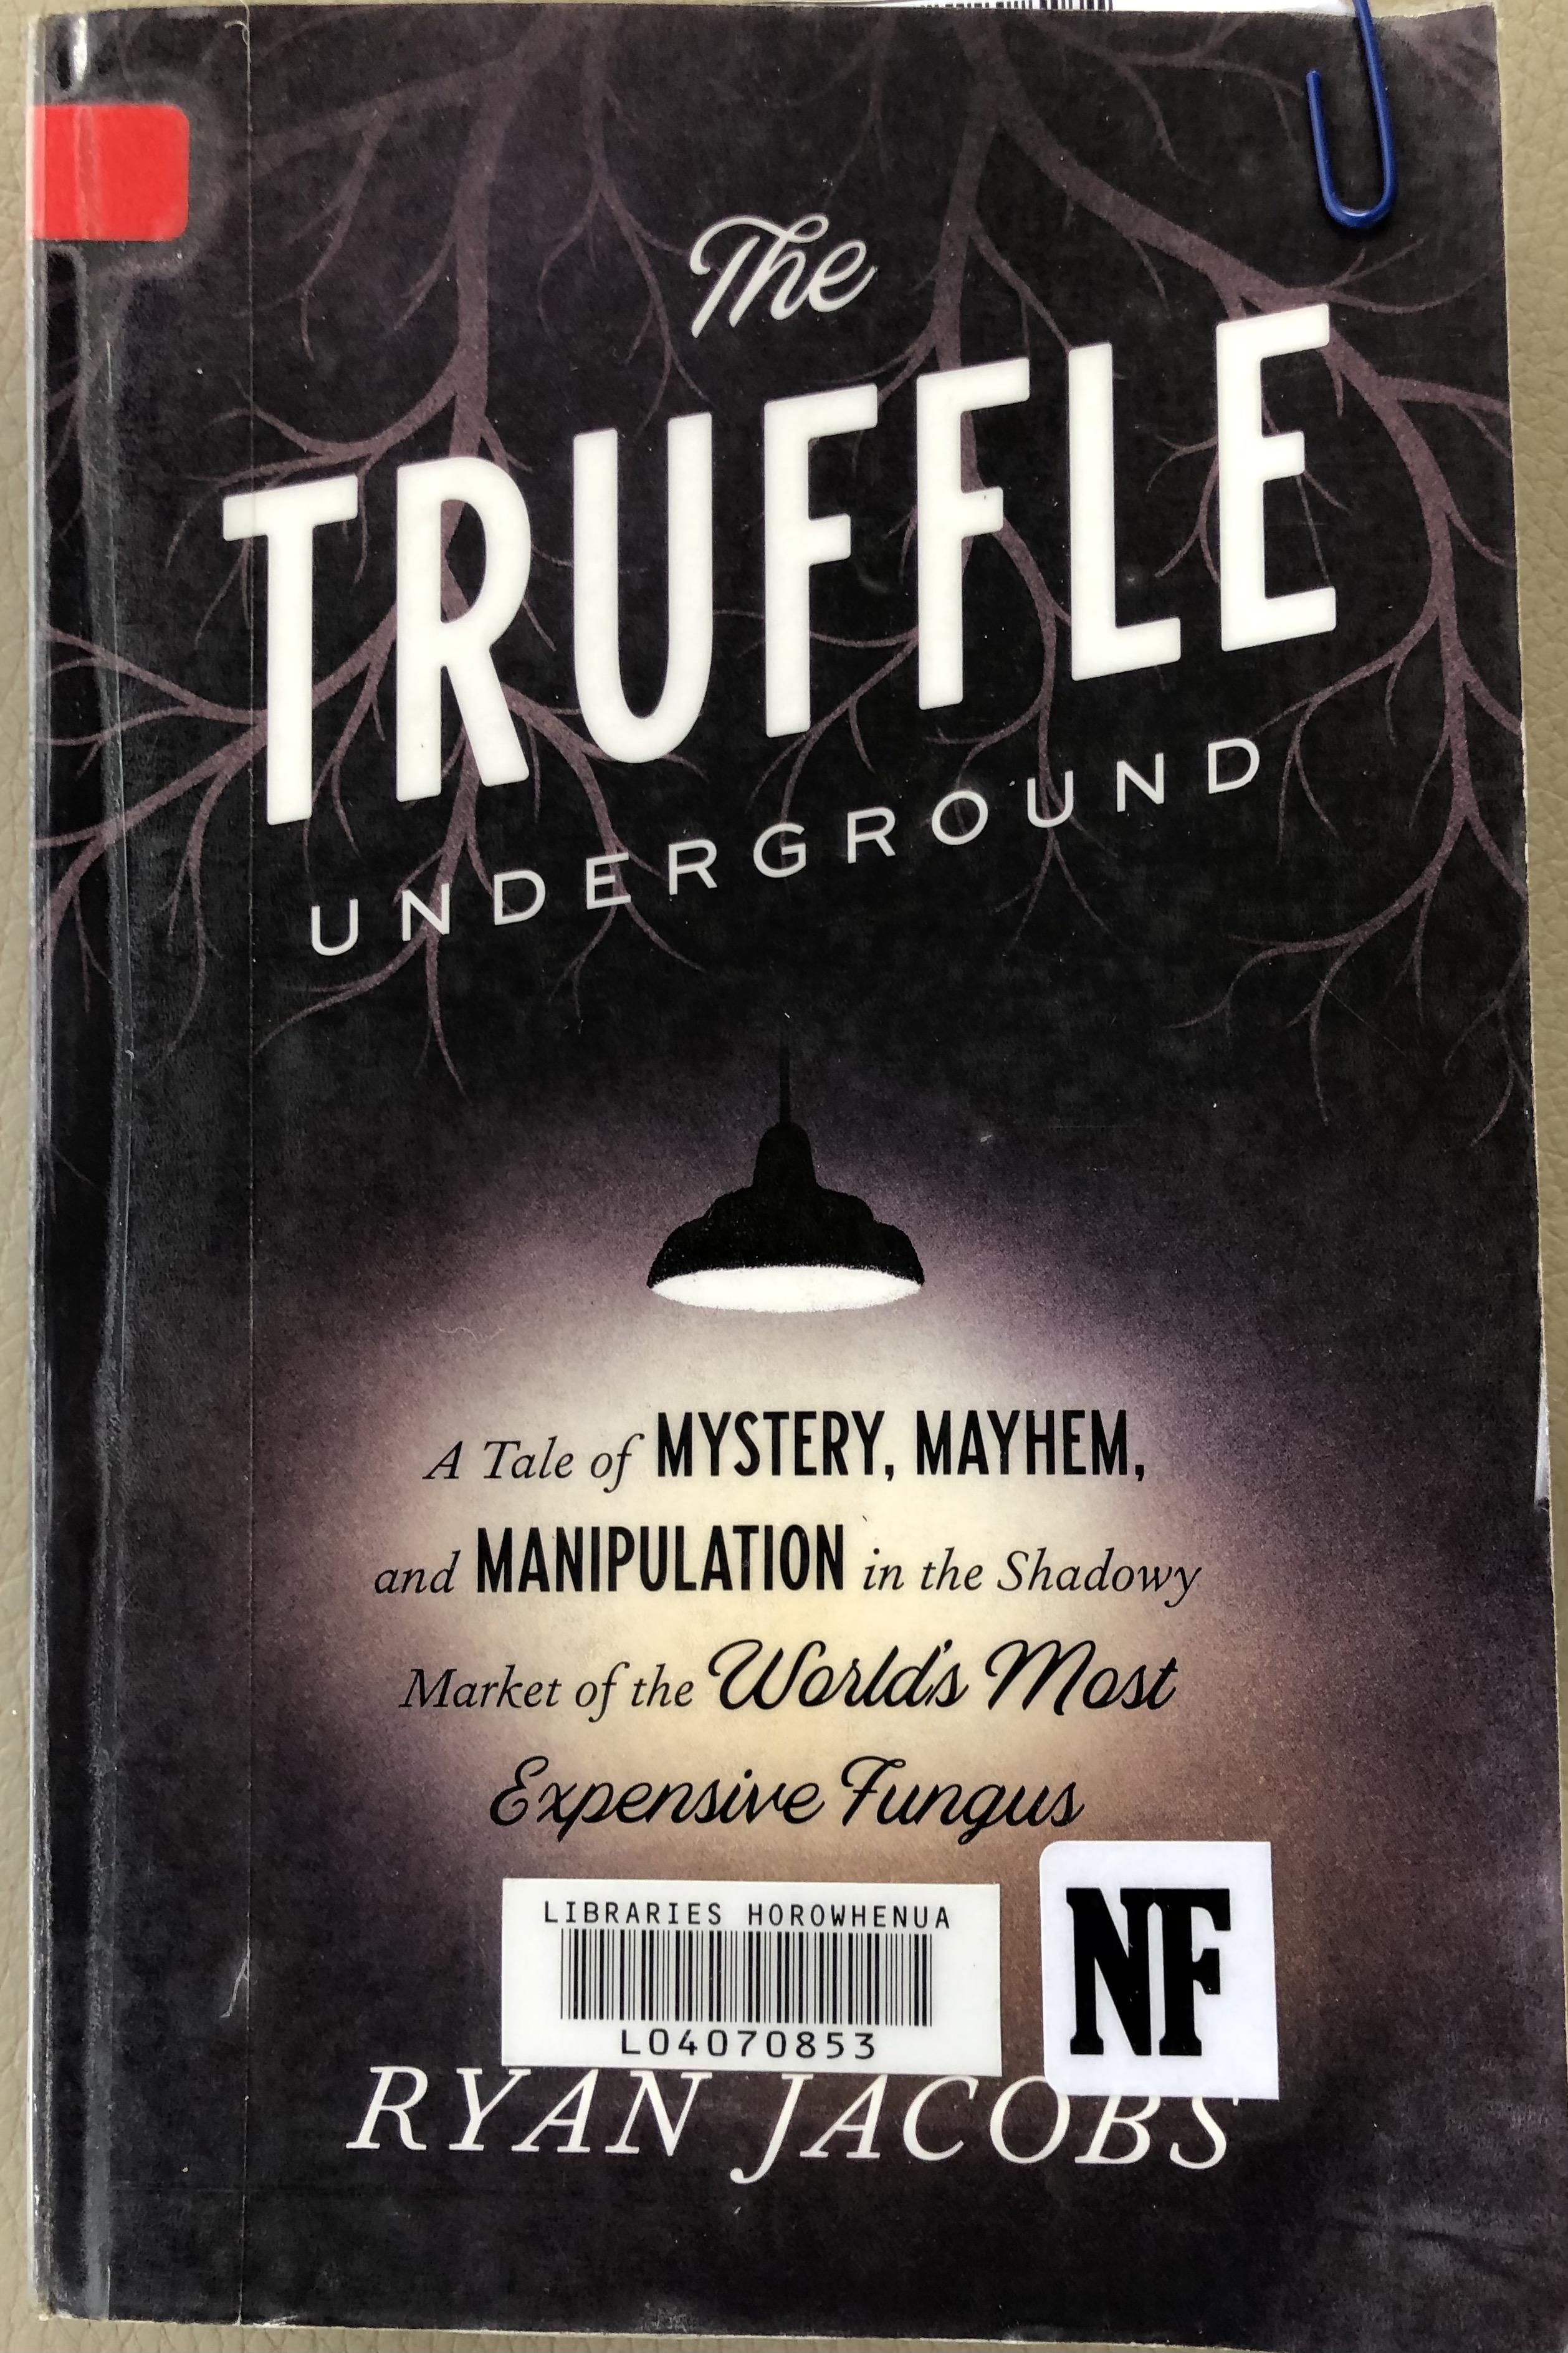 Truffle underground book